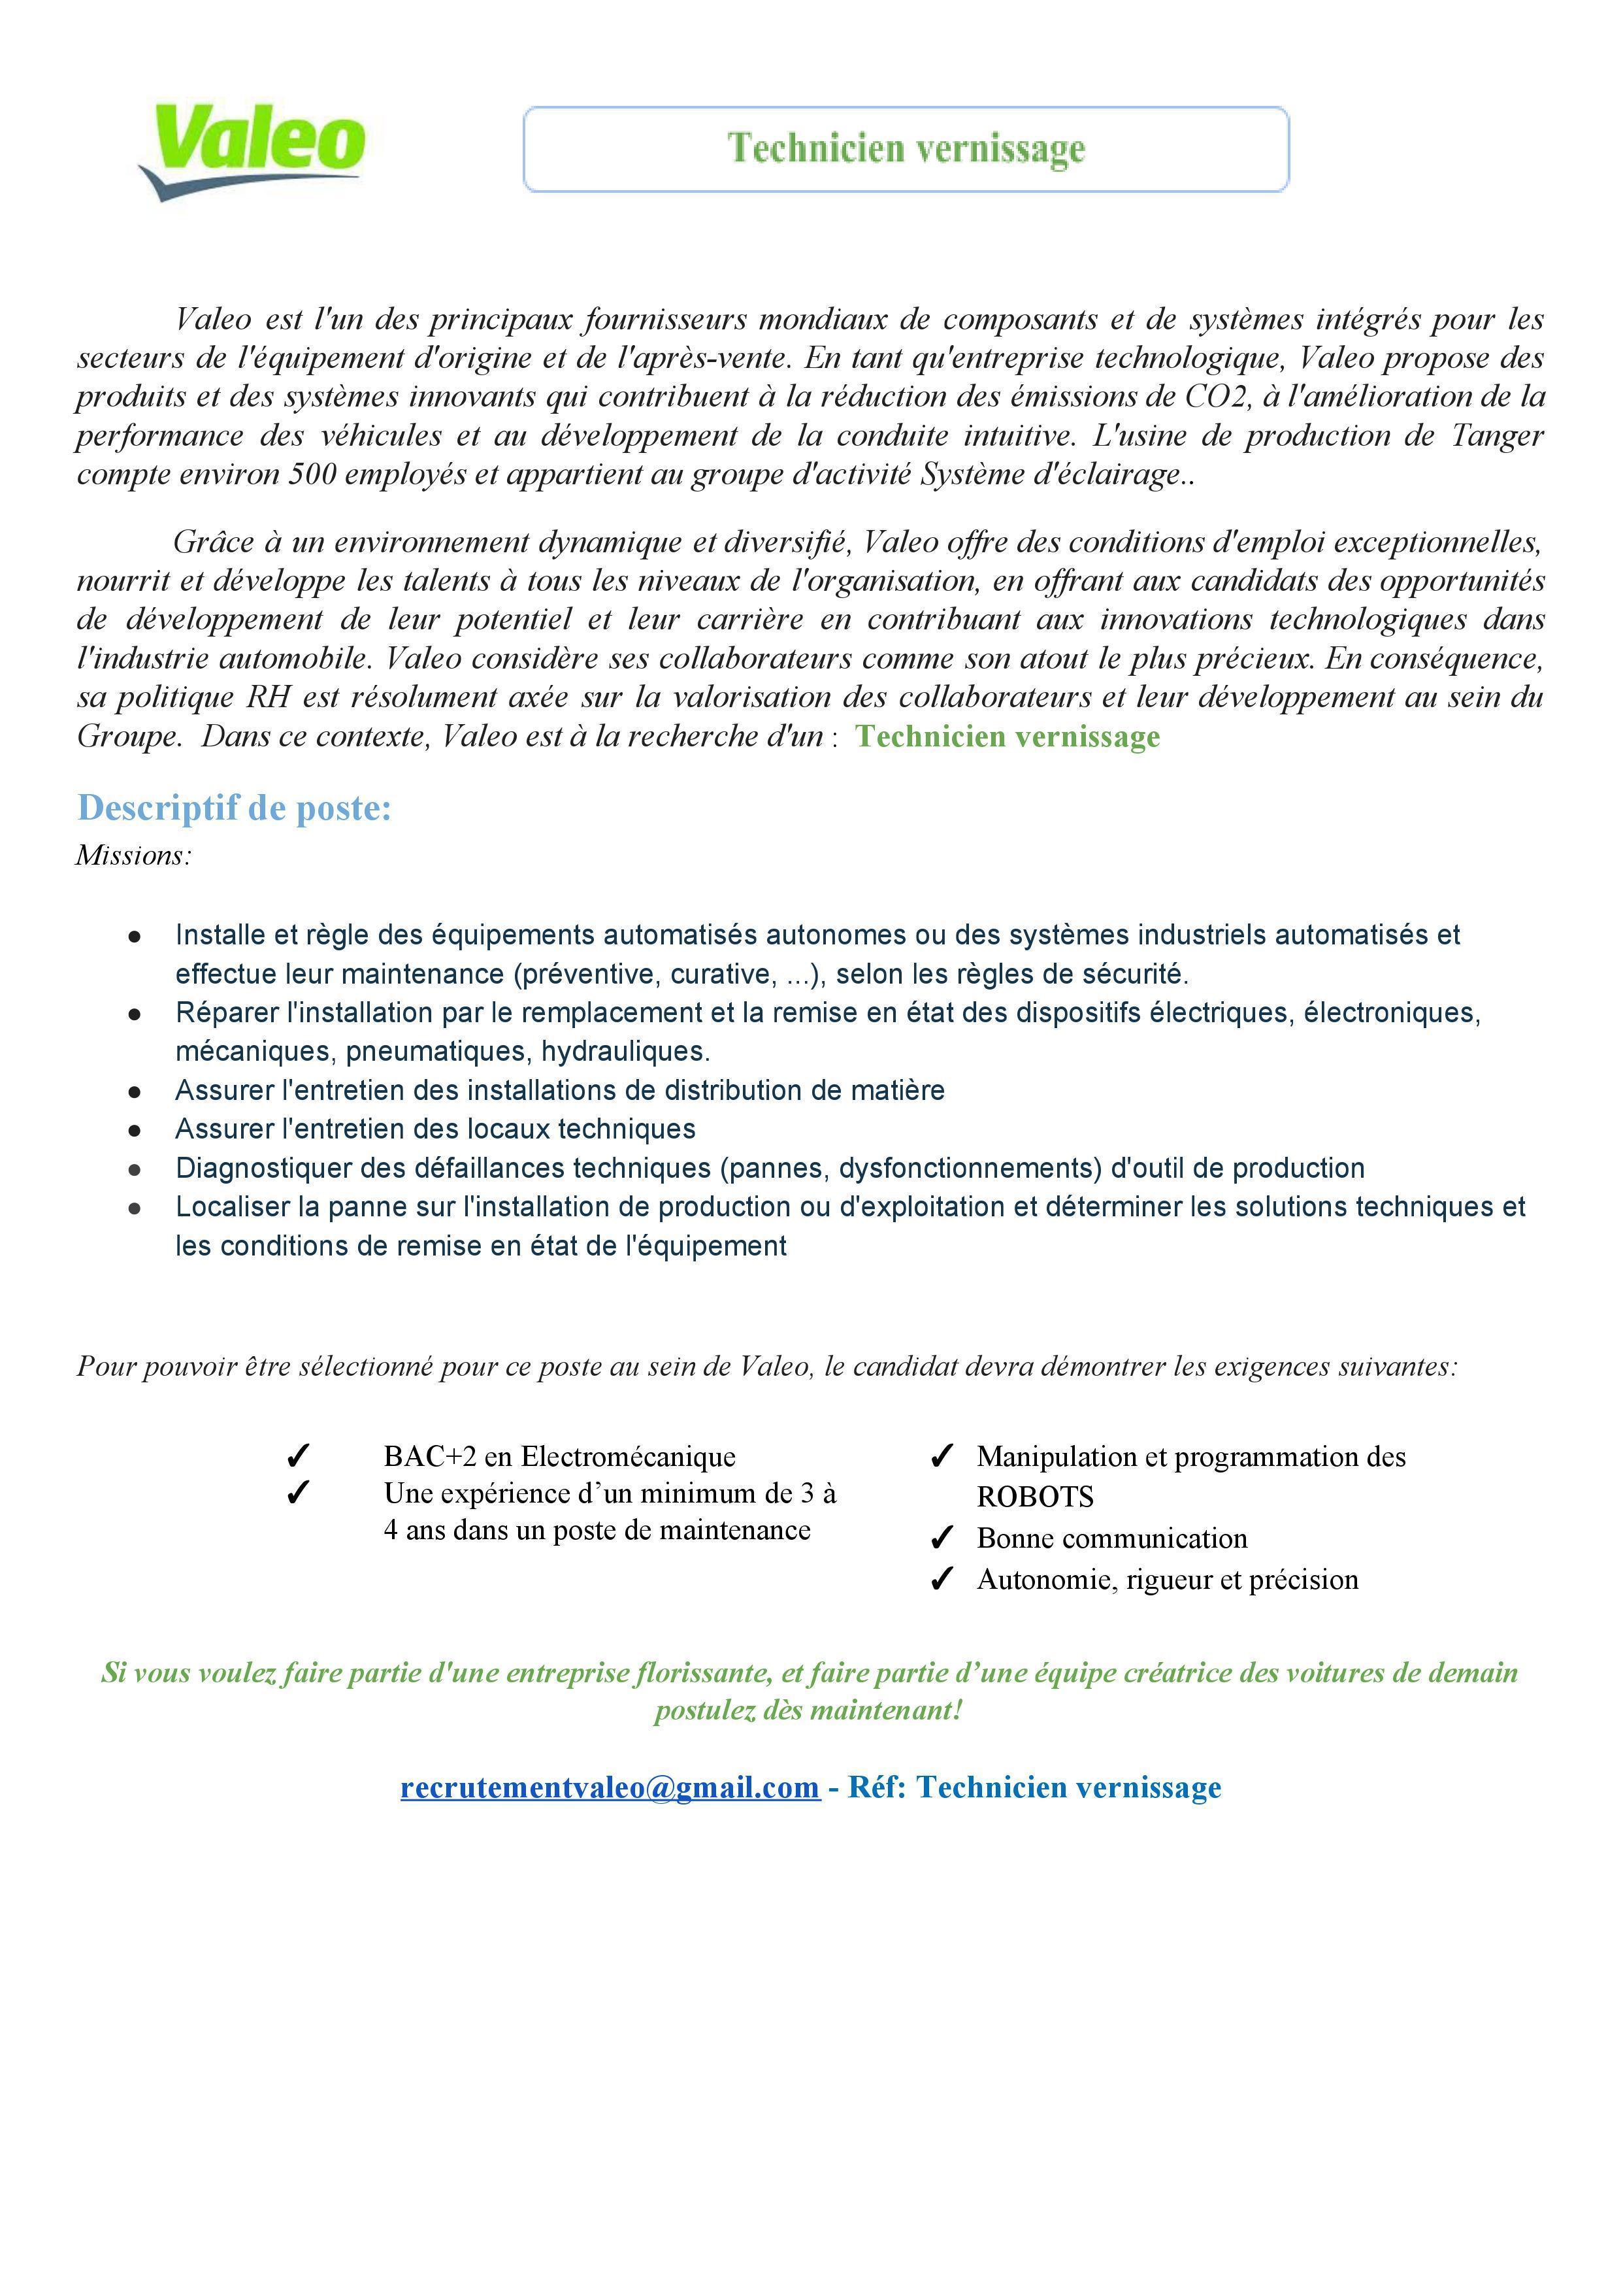 Valeo recrute 3 Profils (Tanger)